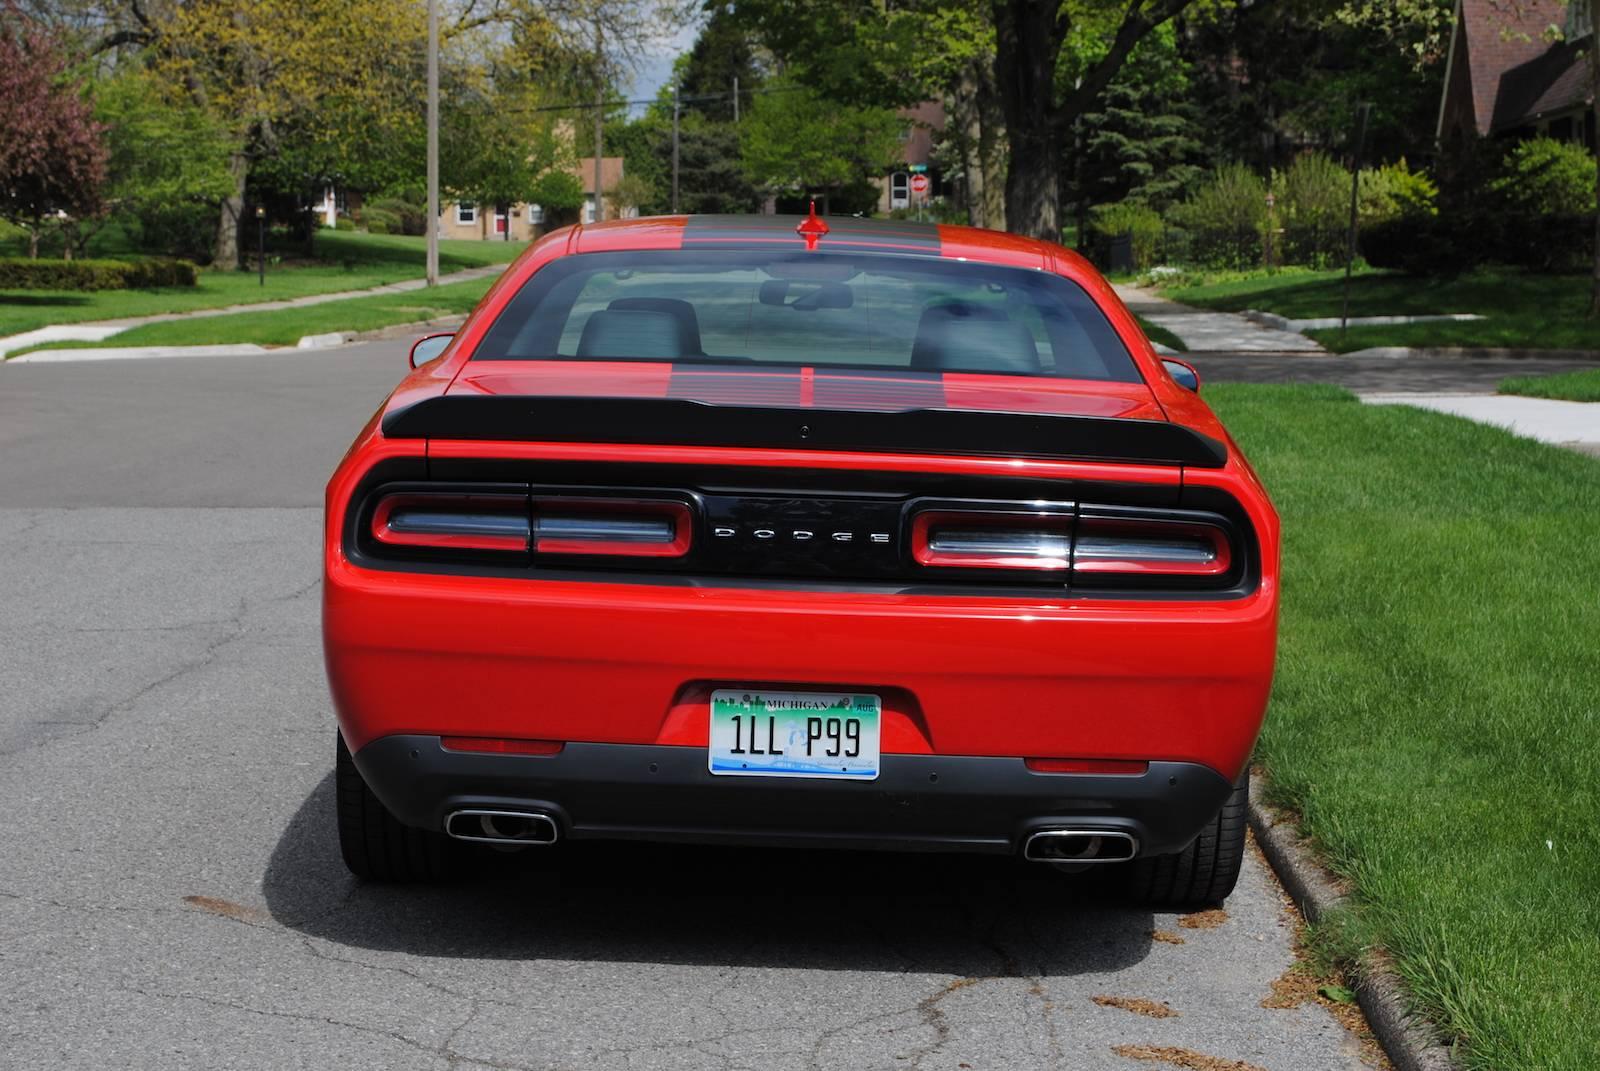 2016 Dodge Challenger Sxt Plus >> 2016 Dodge Challenger SXT Plus Review - GTspirit